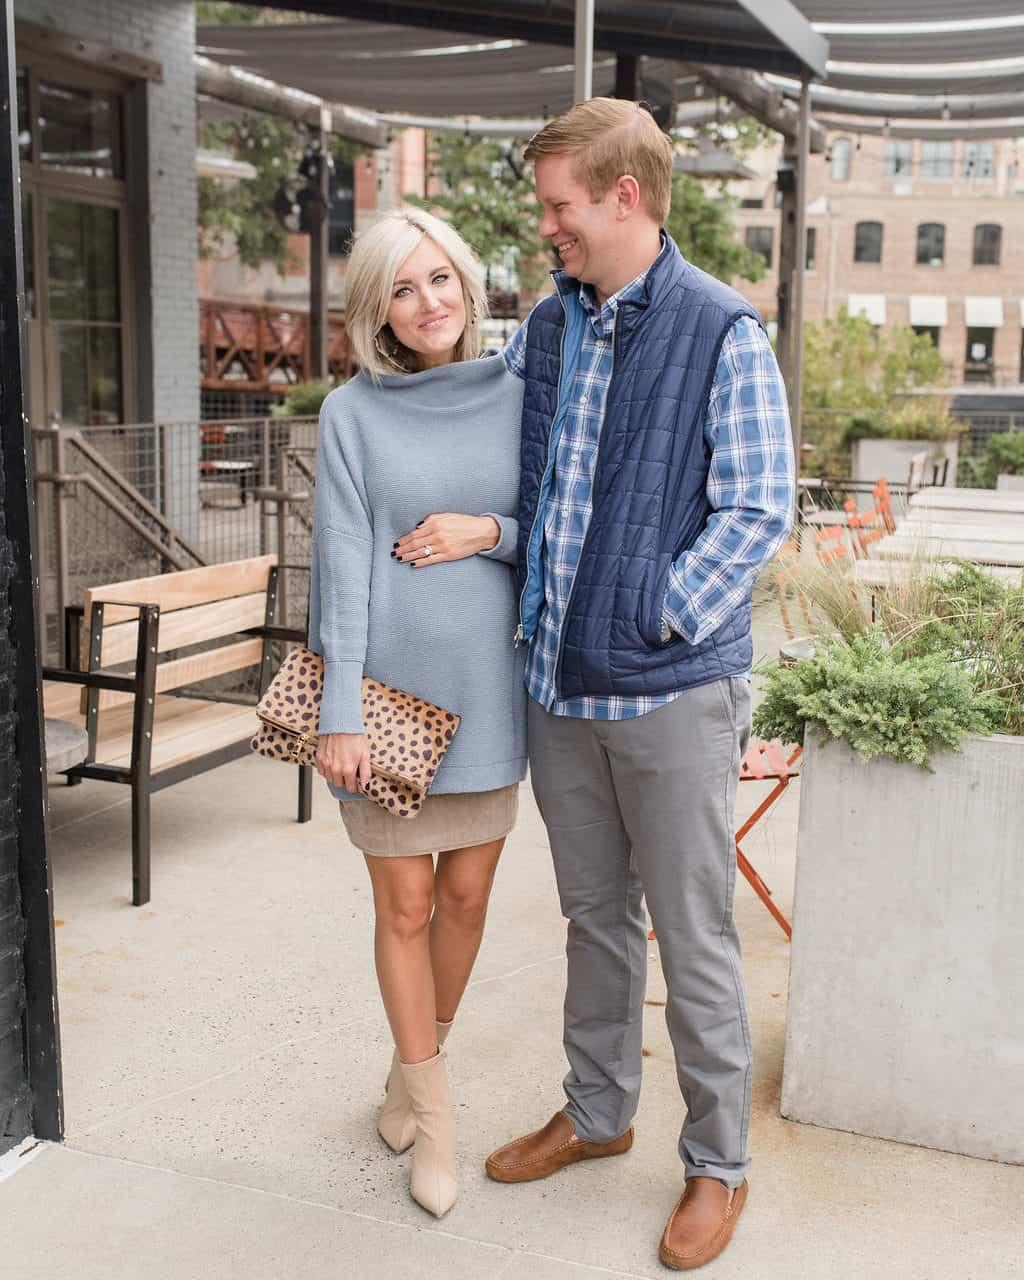 Men's Fashion with Nordstrom – Chris's Picks